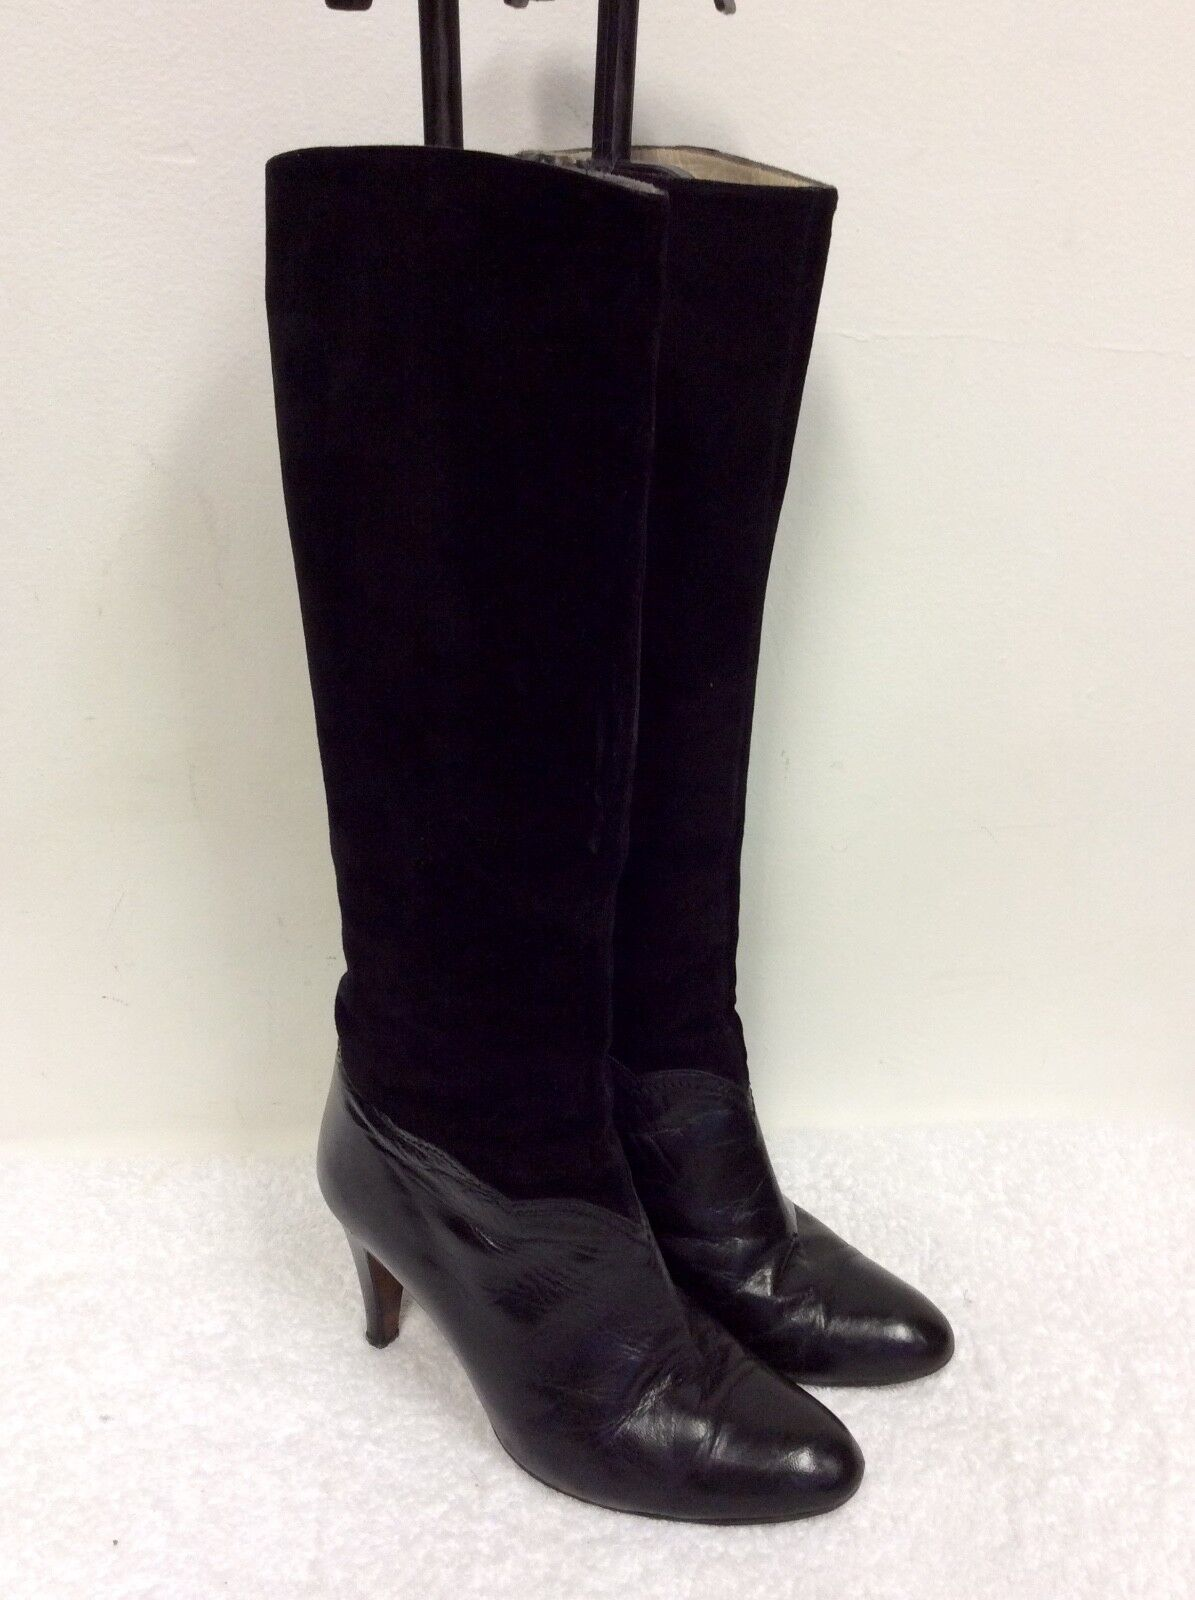 VINTAGE ROSETA BY JUAN TRAID BLACK SUEDE & LEATHER KNEE LENGTH Stiefel SIZE 4/37